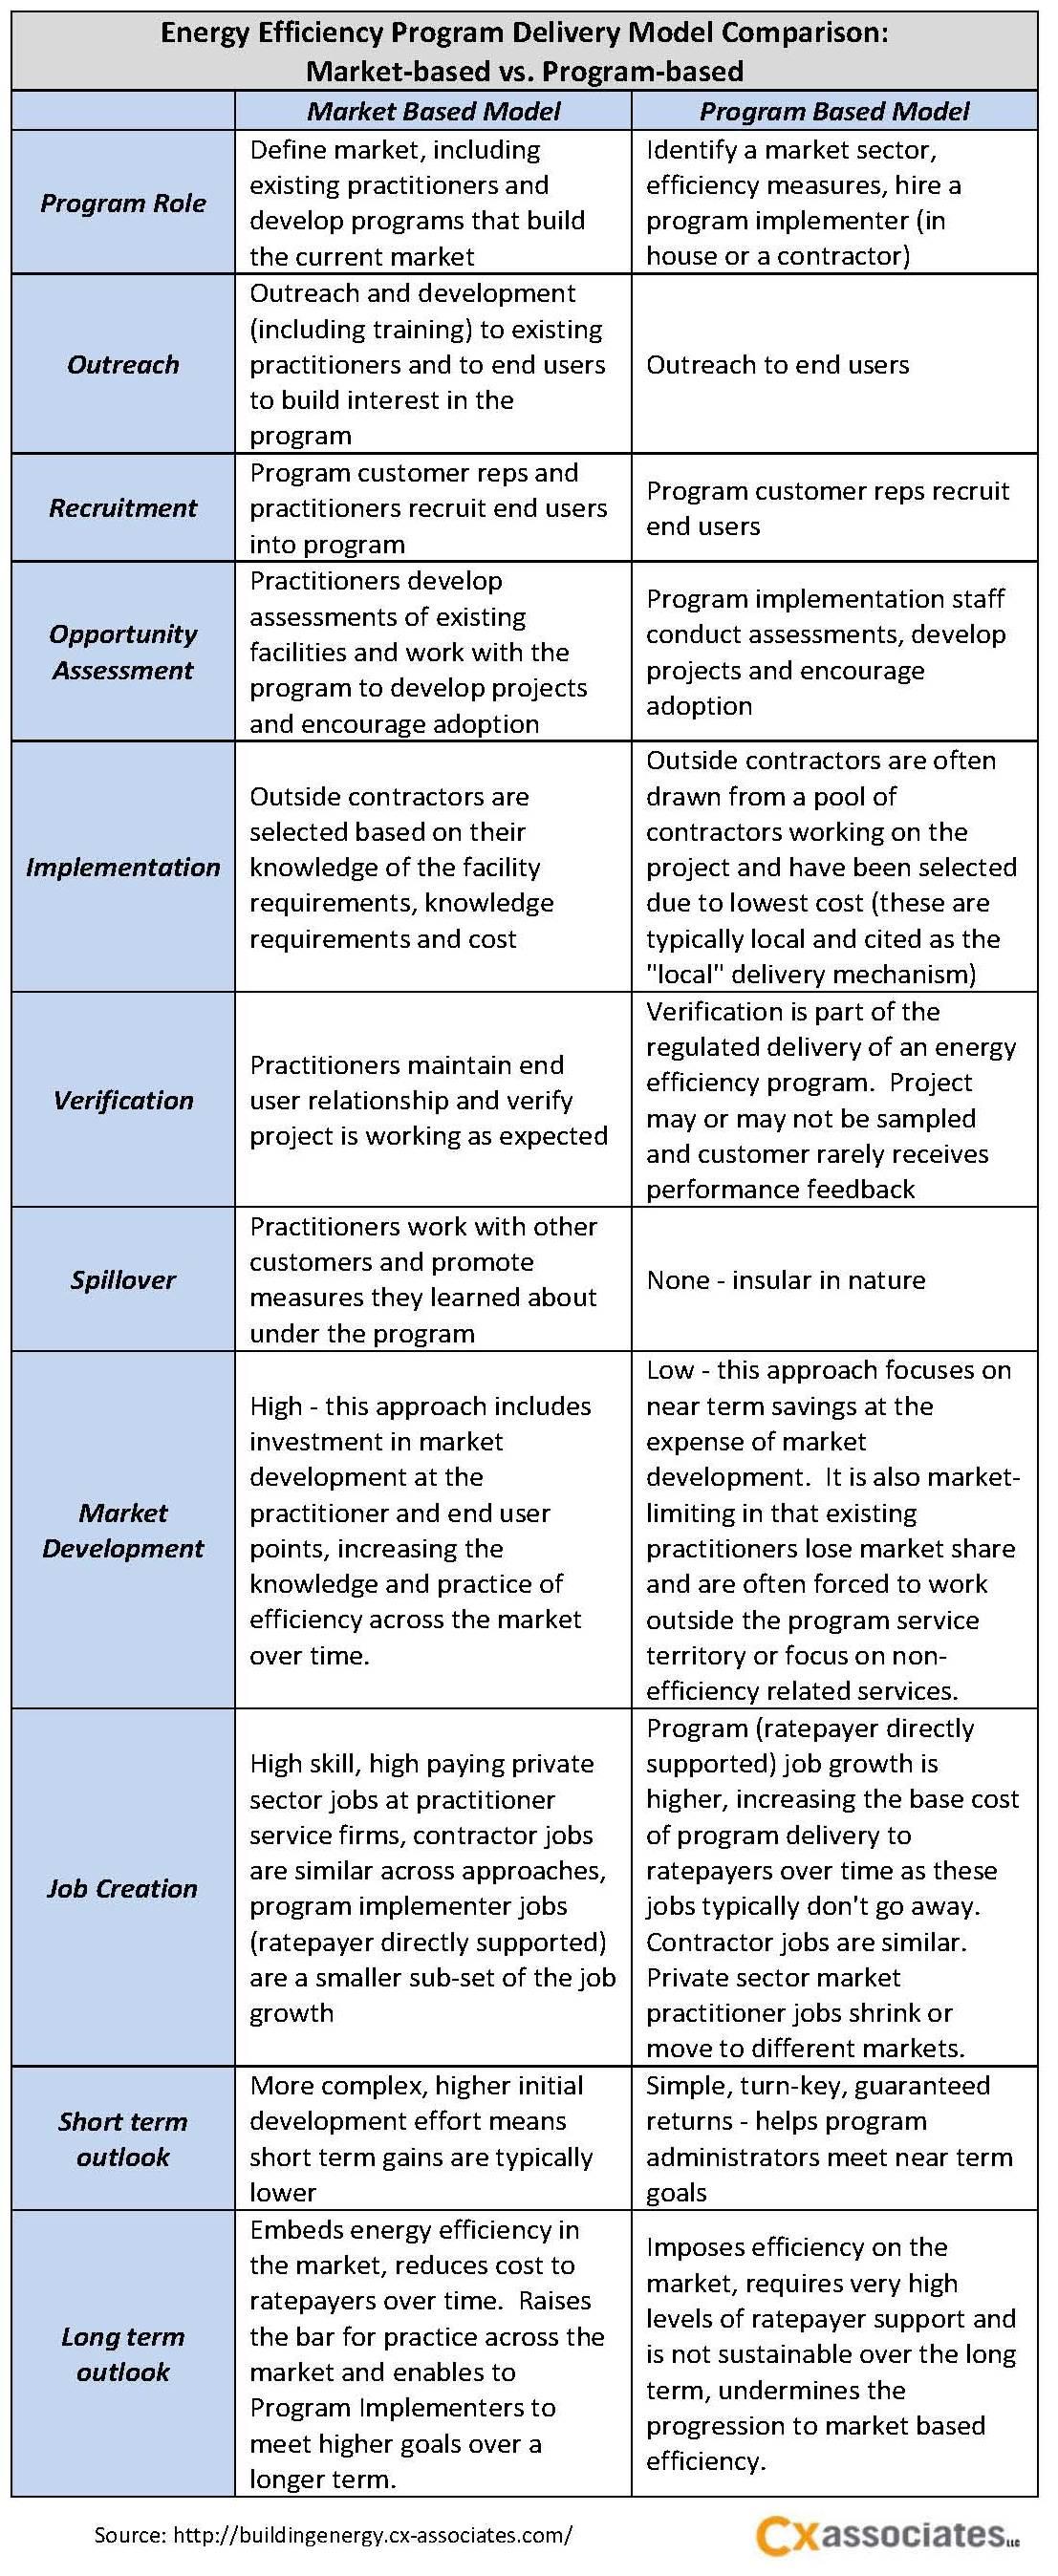 Energy Efficiency Program Delivery Model Comparison: Market‐based vs. Program‐based